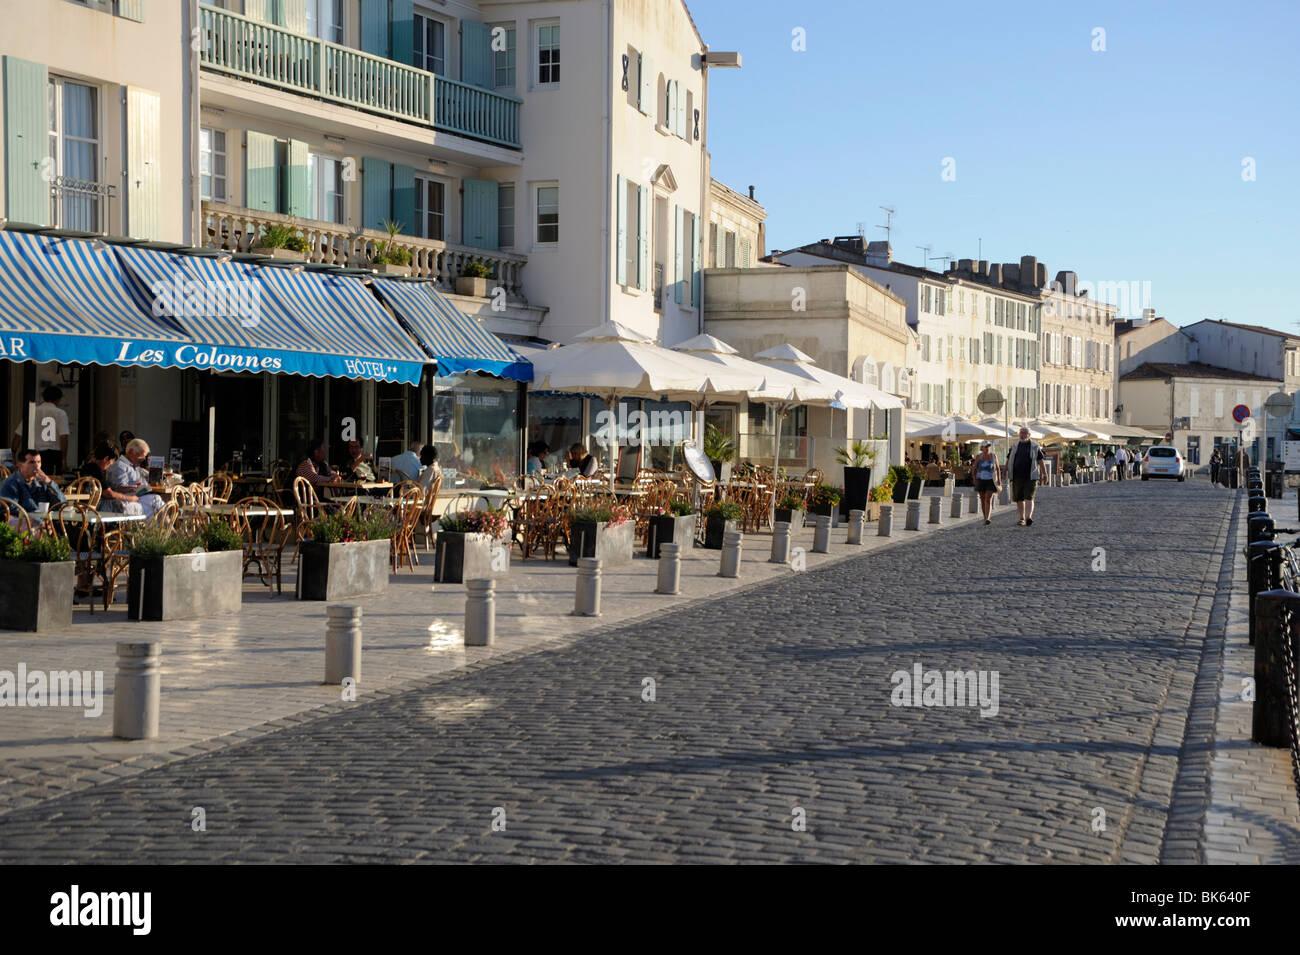 Quayside Restaurants St Martin De Re Ile De Re Charente Maritime